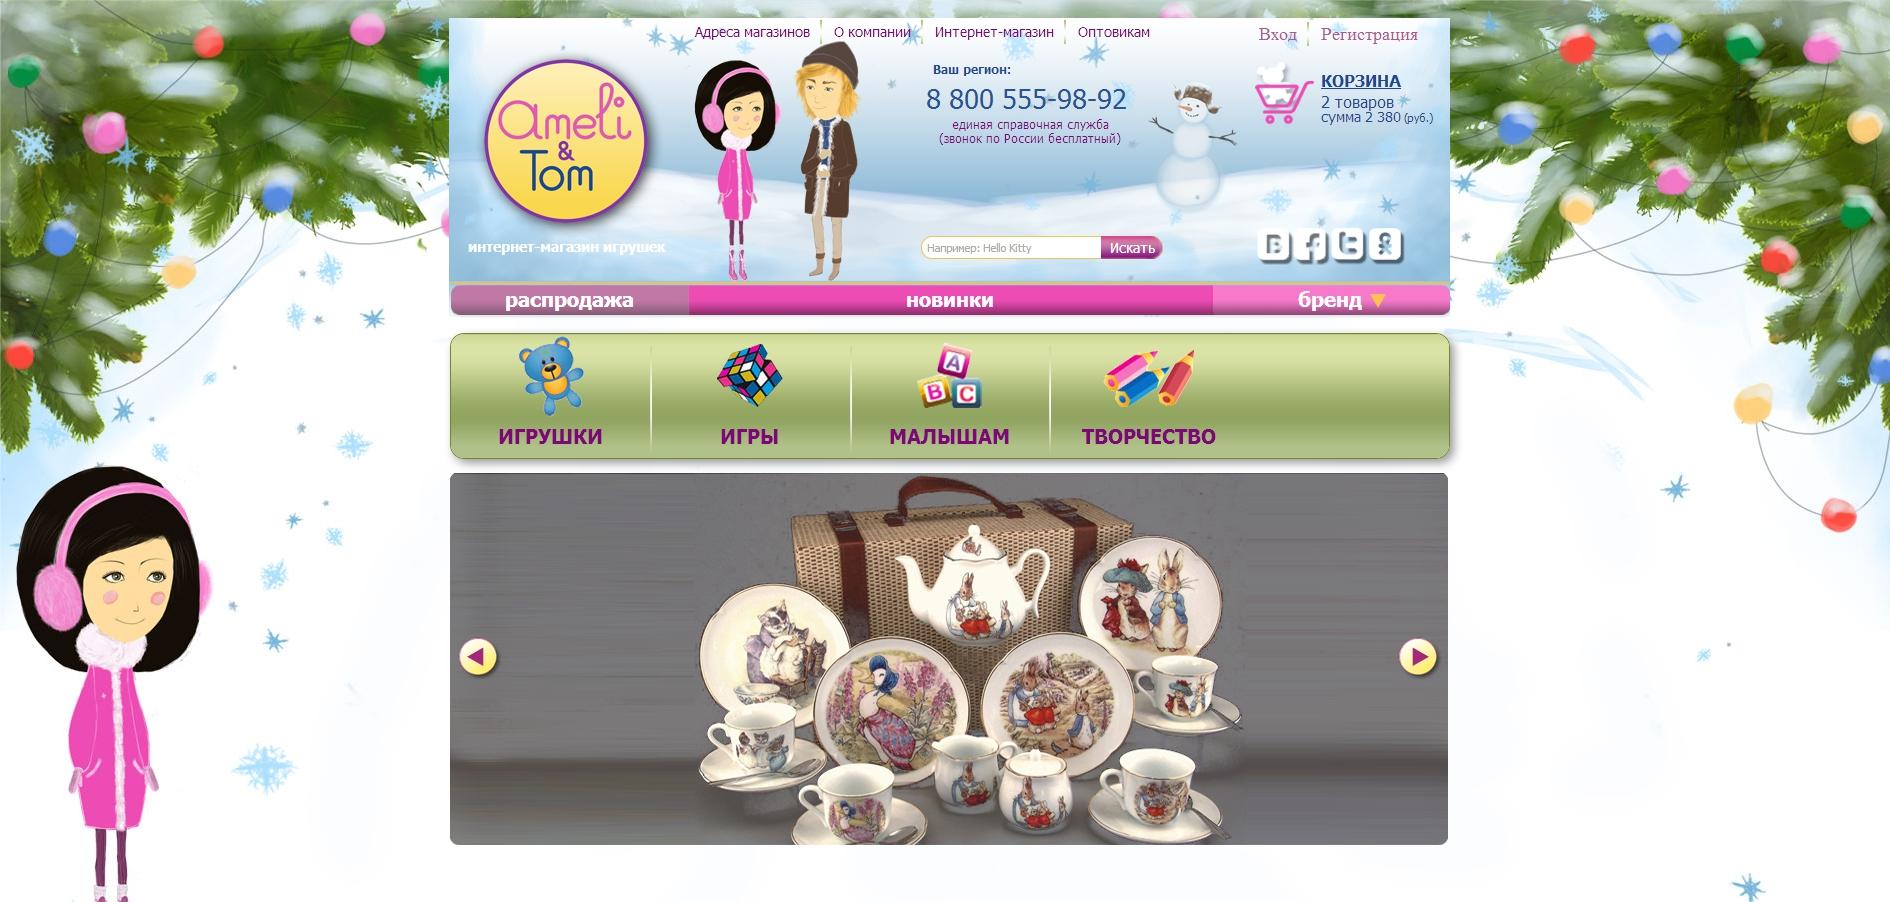 "Интернет-магазин игрушек ""Ameli & Tom"" (1С-Битрикс)"